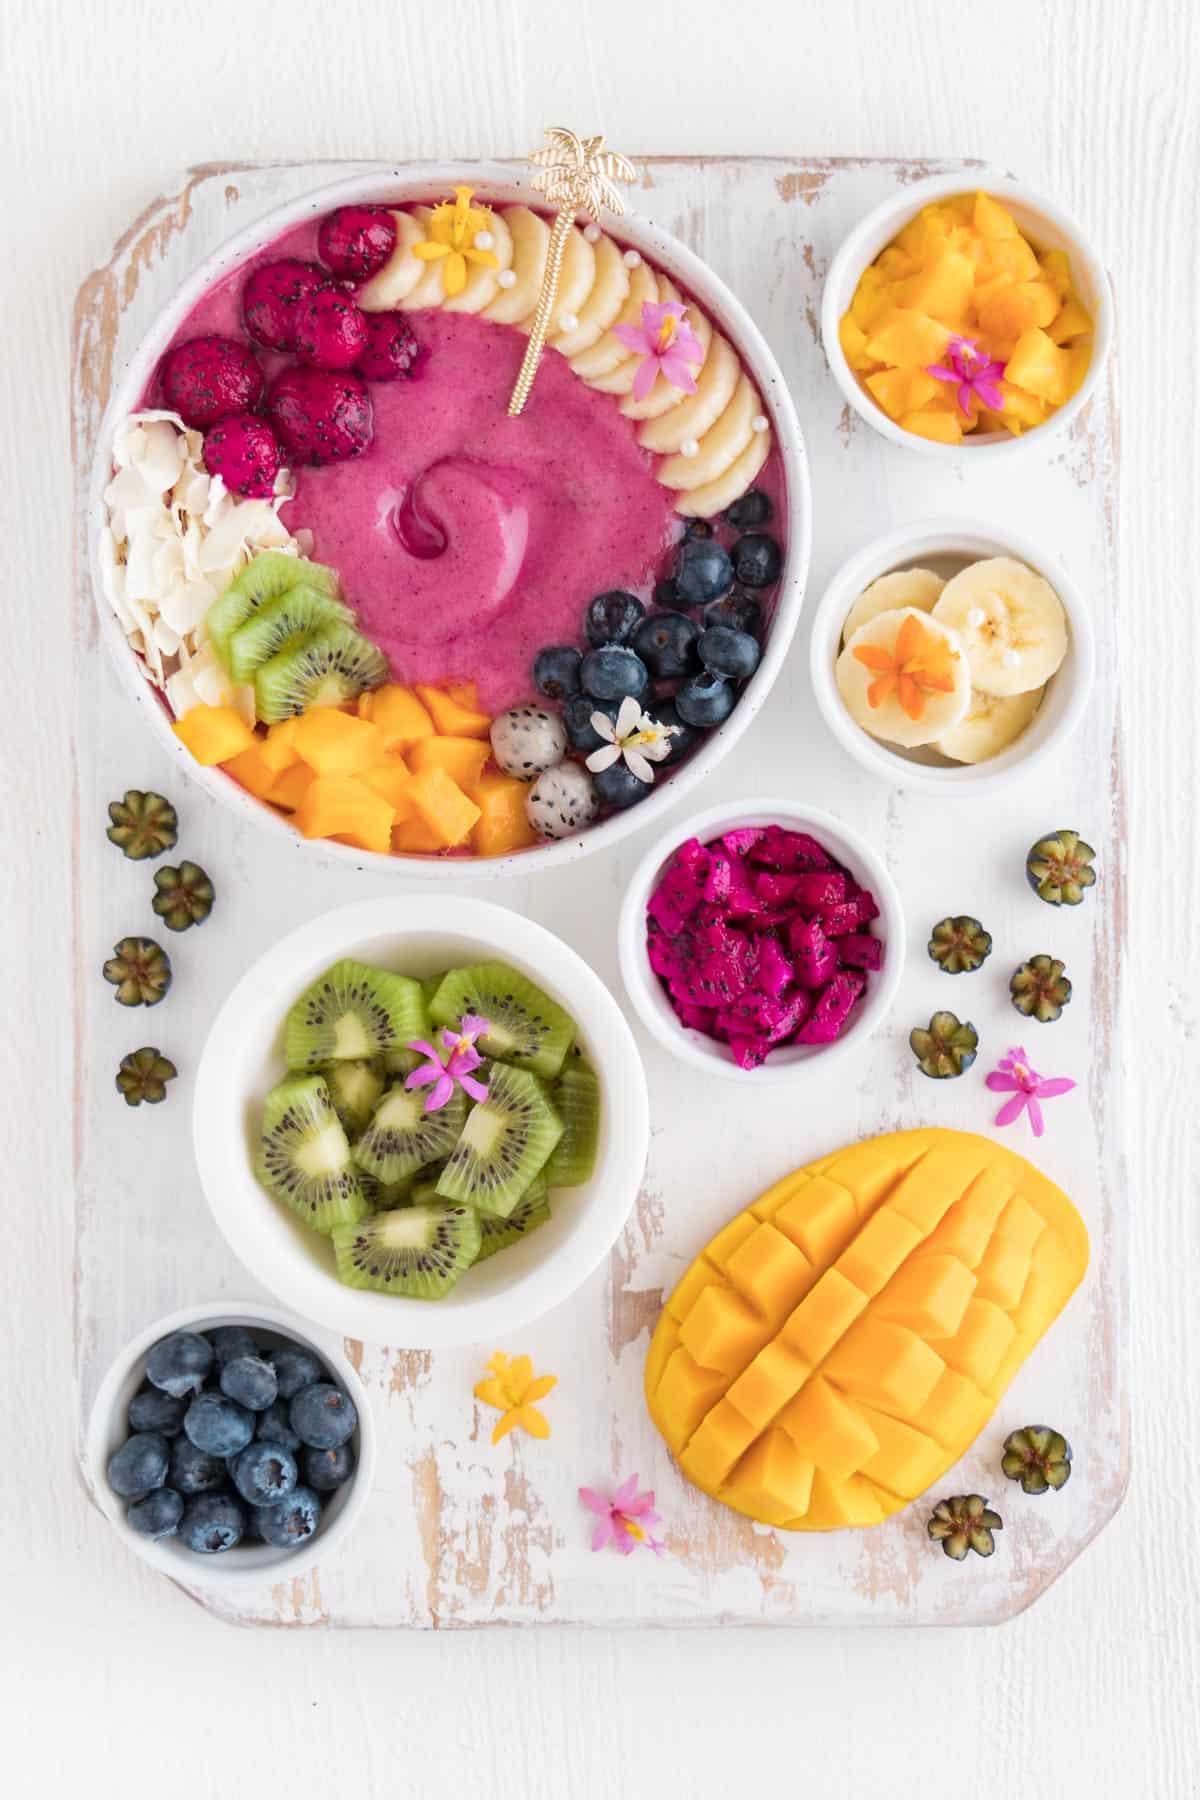 mango, kiwi, blueberries, and dragon fruit